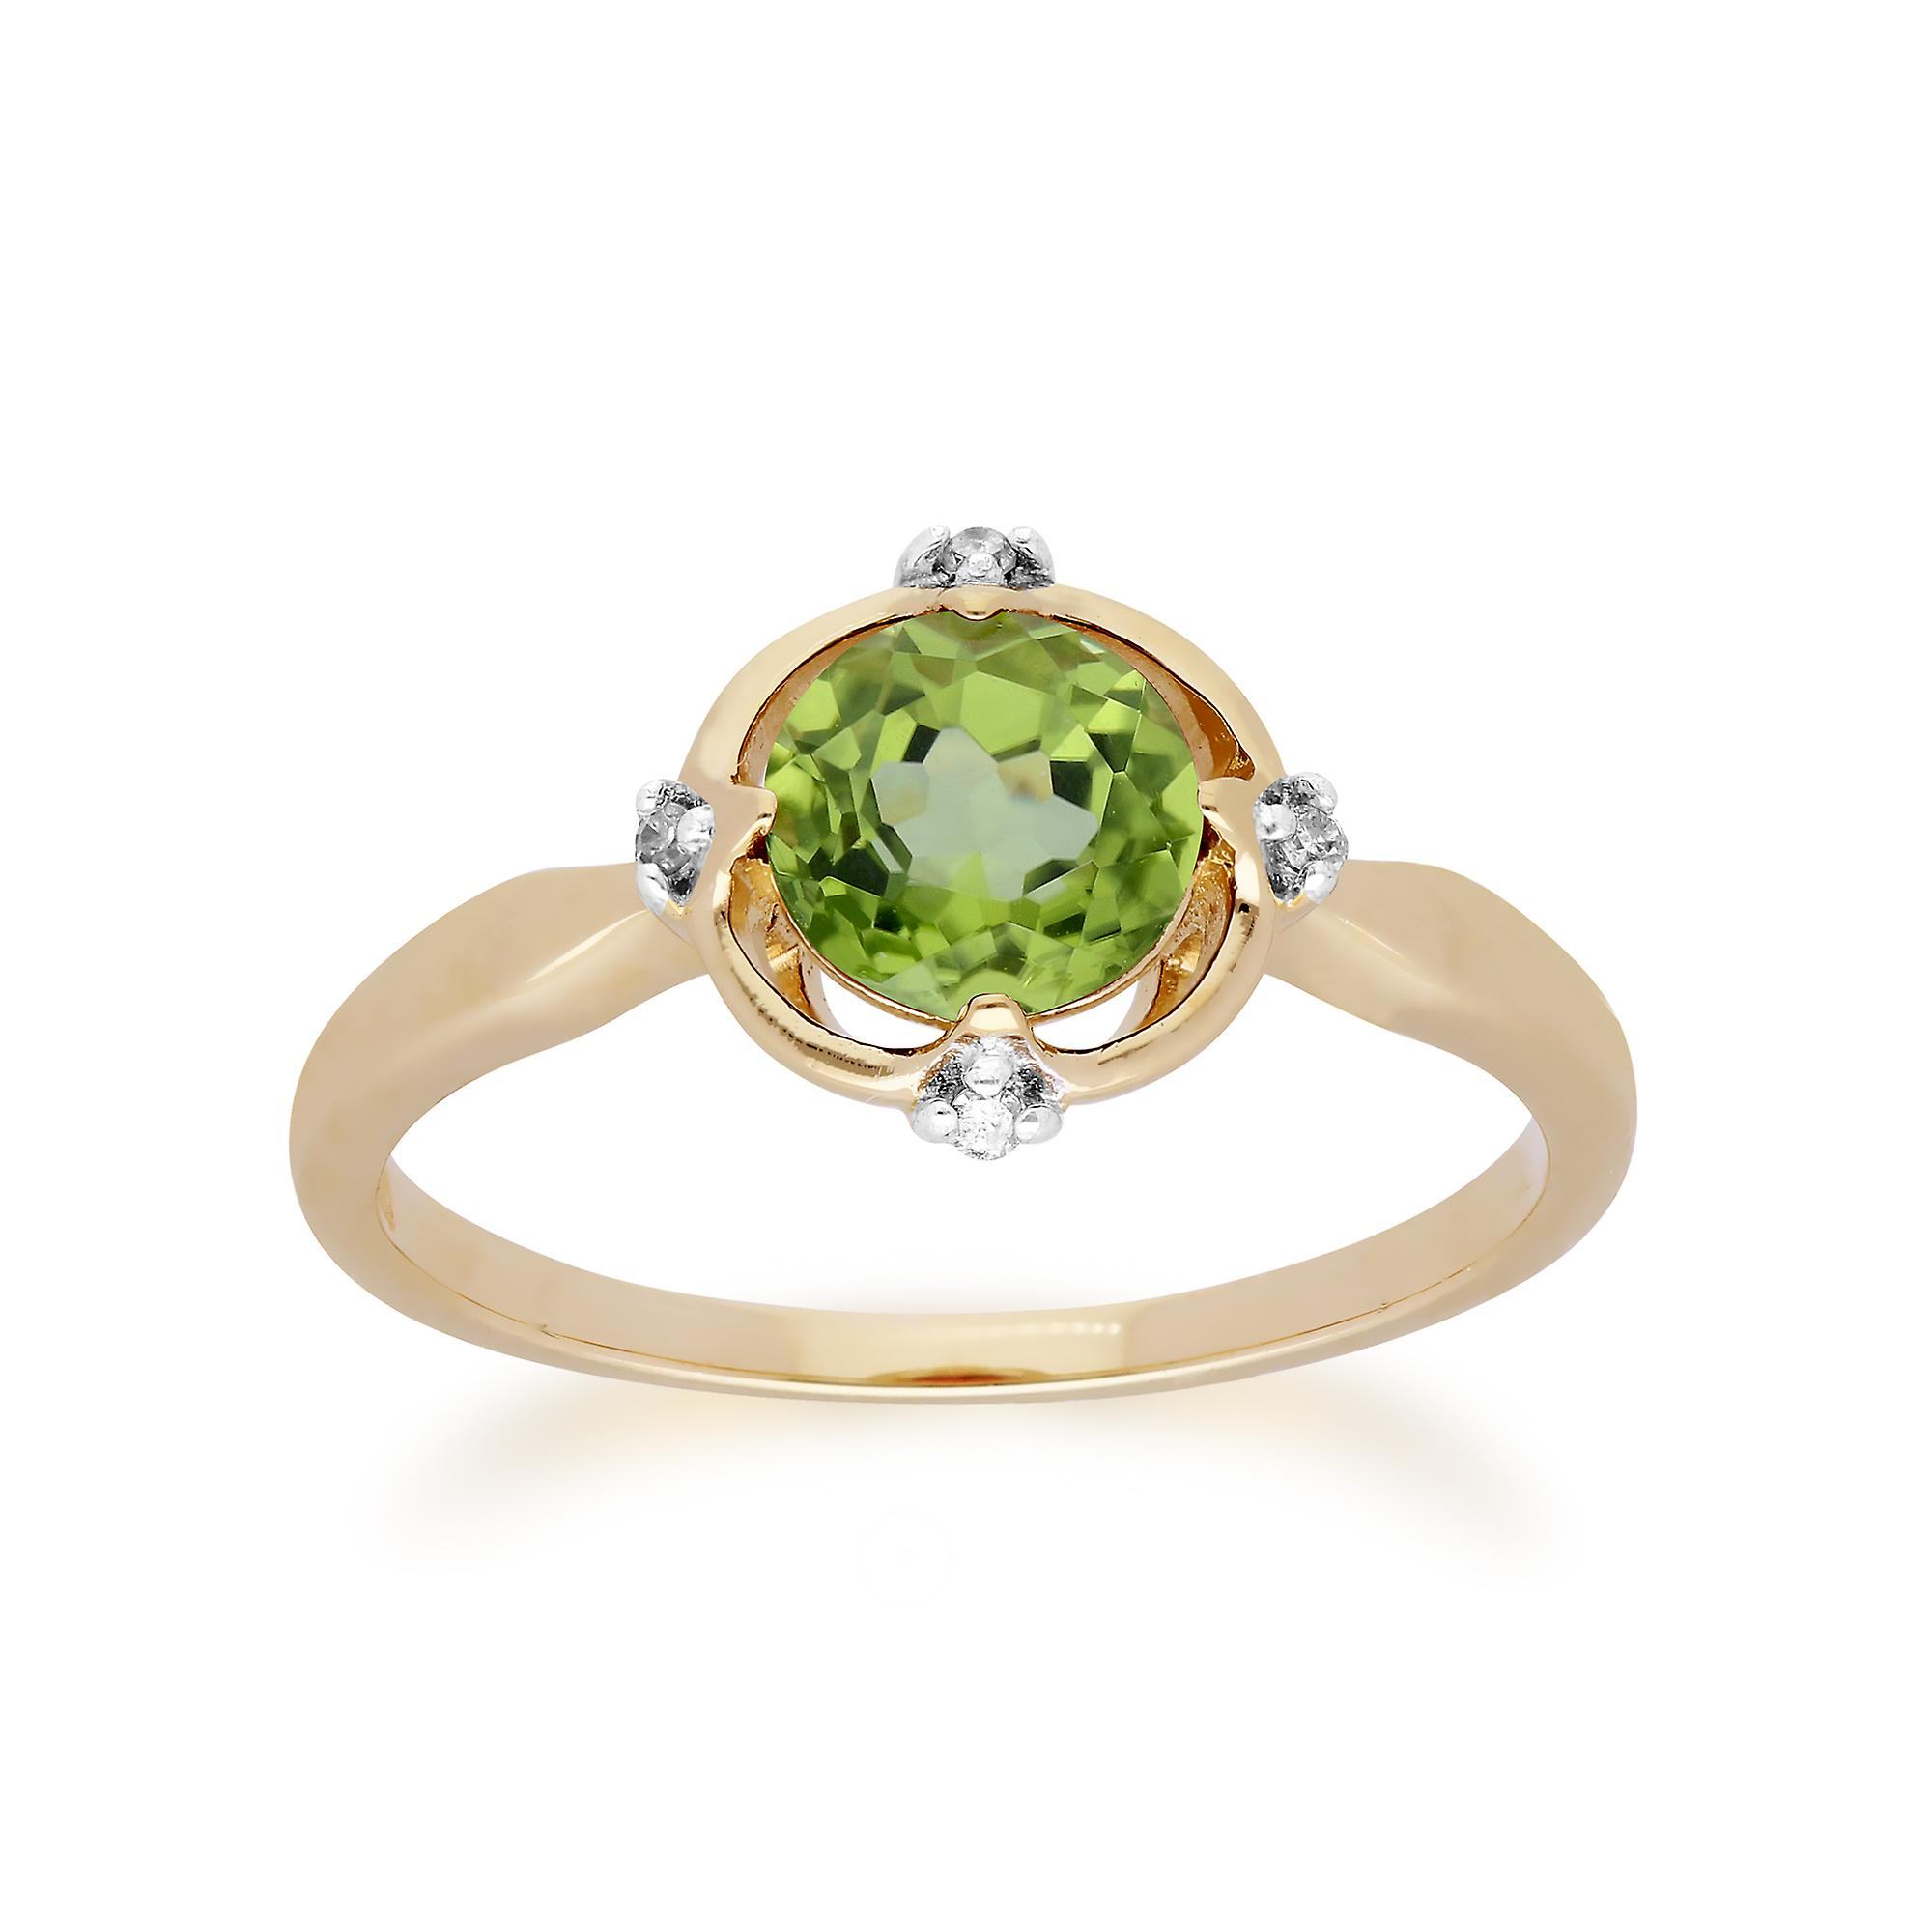 Gemondo 9ct Yellow Gold Halo Peridot & Diamond Round Cut Ring